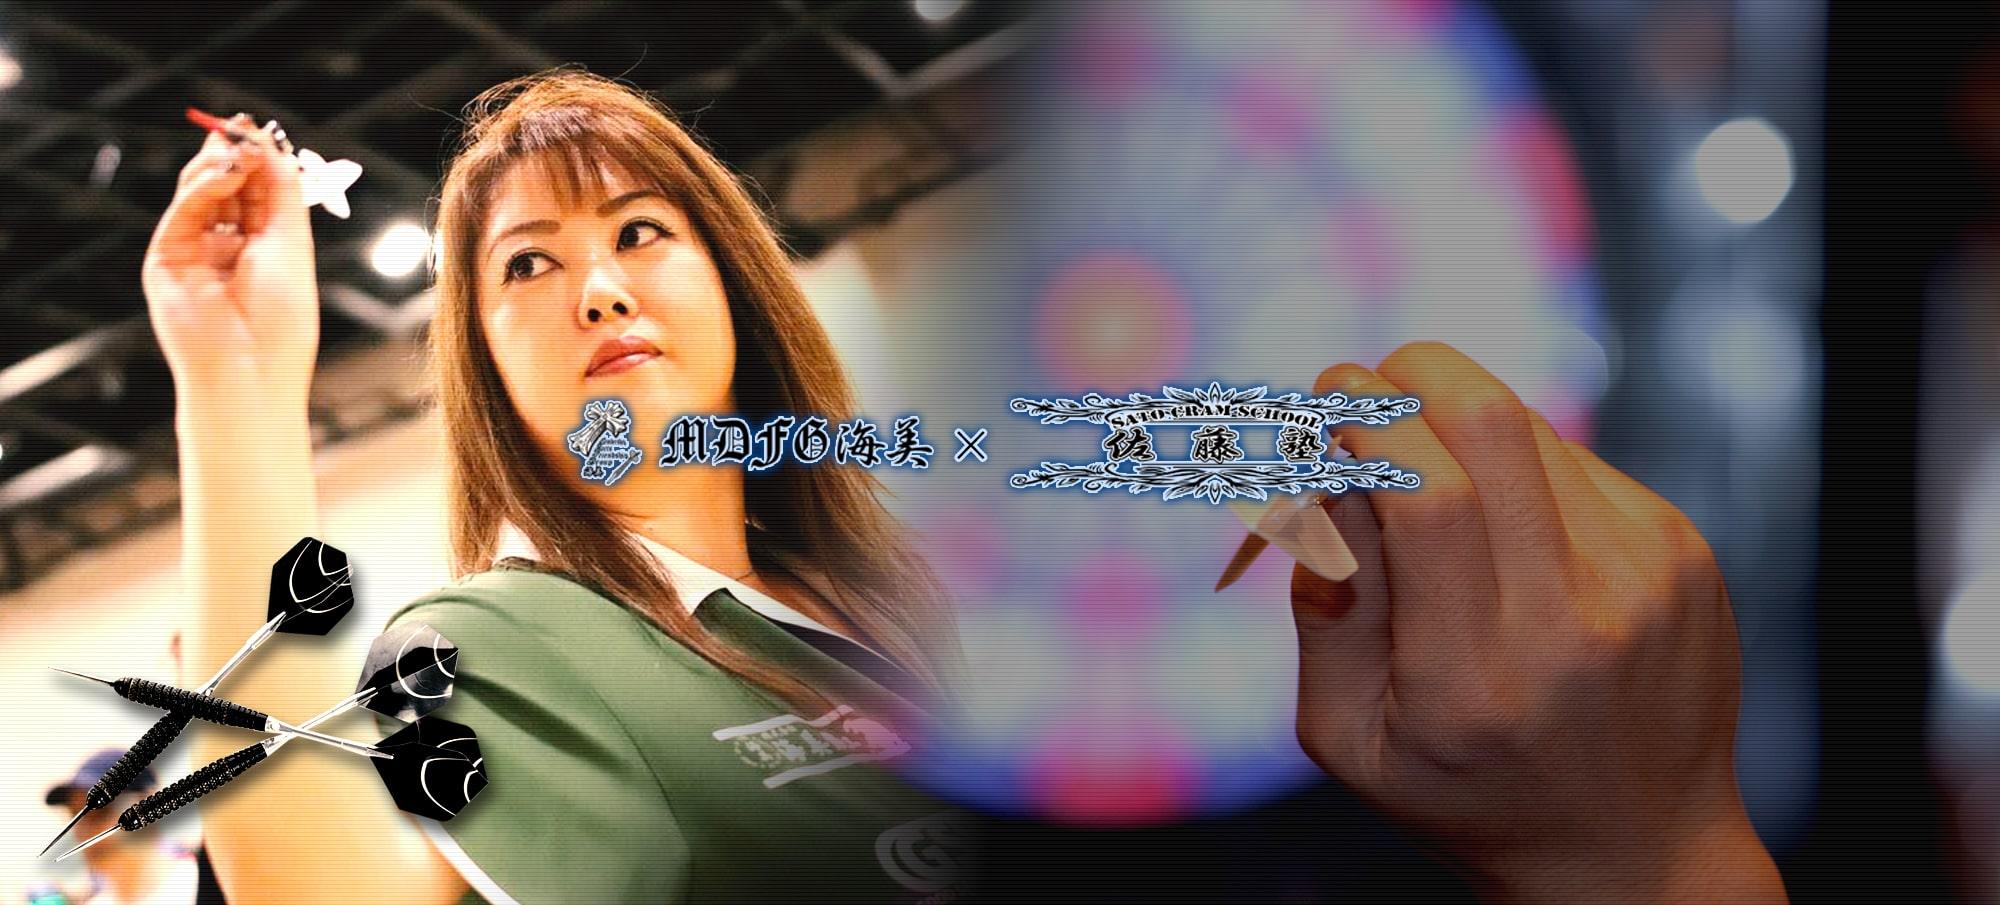 MembersArea MDFG海美×sato cram school 佐藤塾